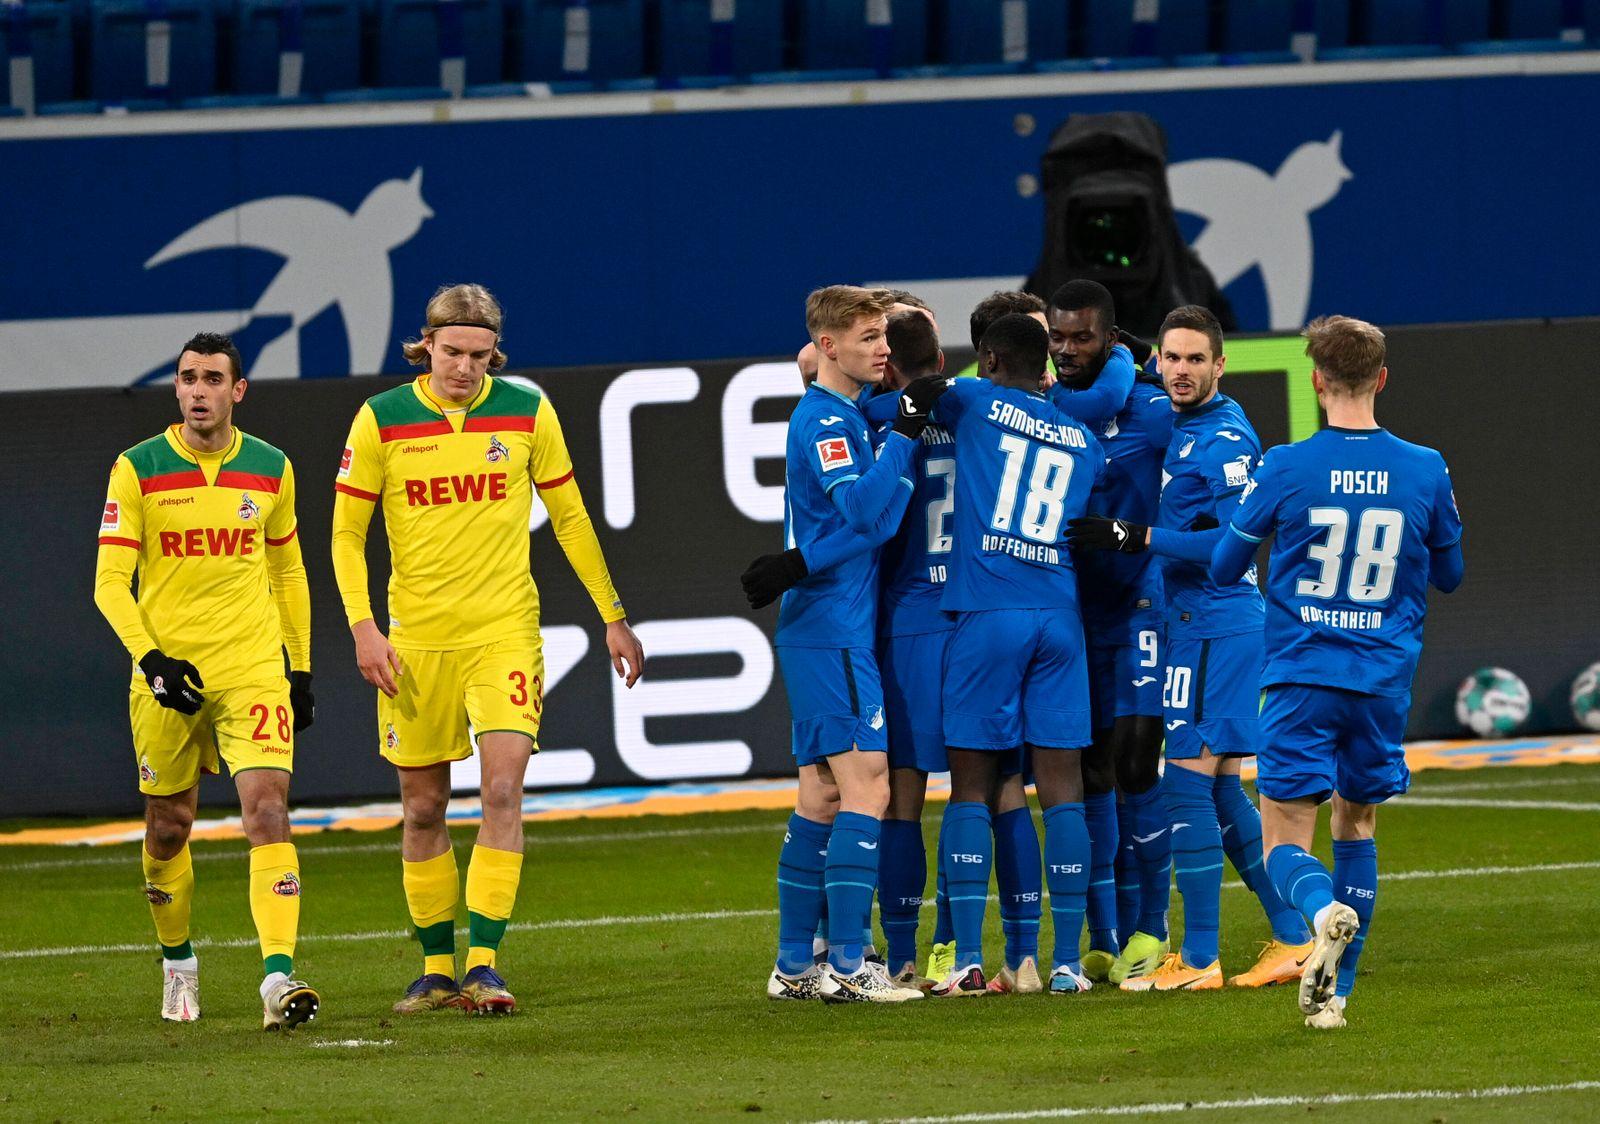 TOR zum 1:0 Andrej Kramaric TSG 1899 Hoffenheim ( 27) gegen Torwart Timo Horn 1. FC Köln Koeln ( 01) Strafstoß, Elfmeter